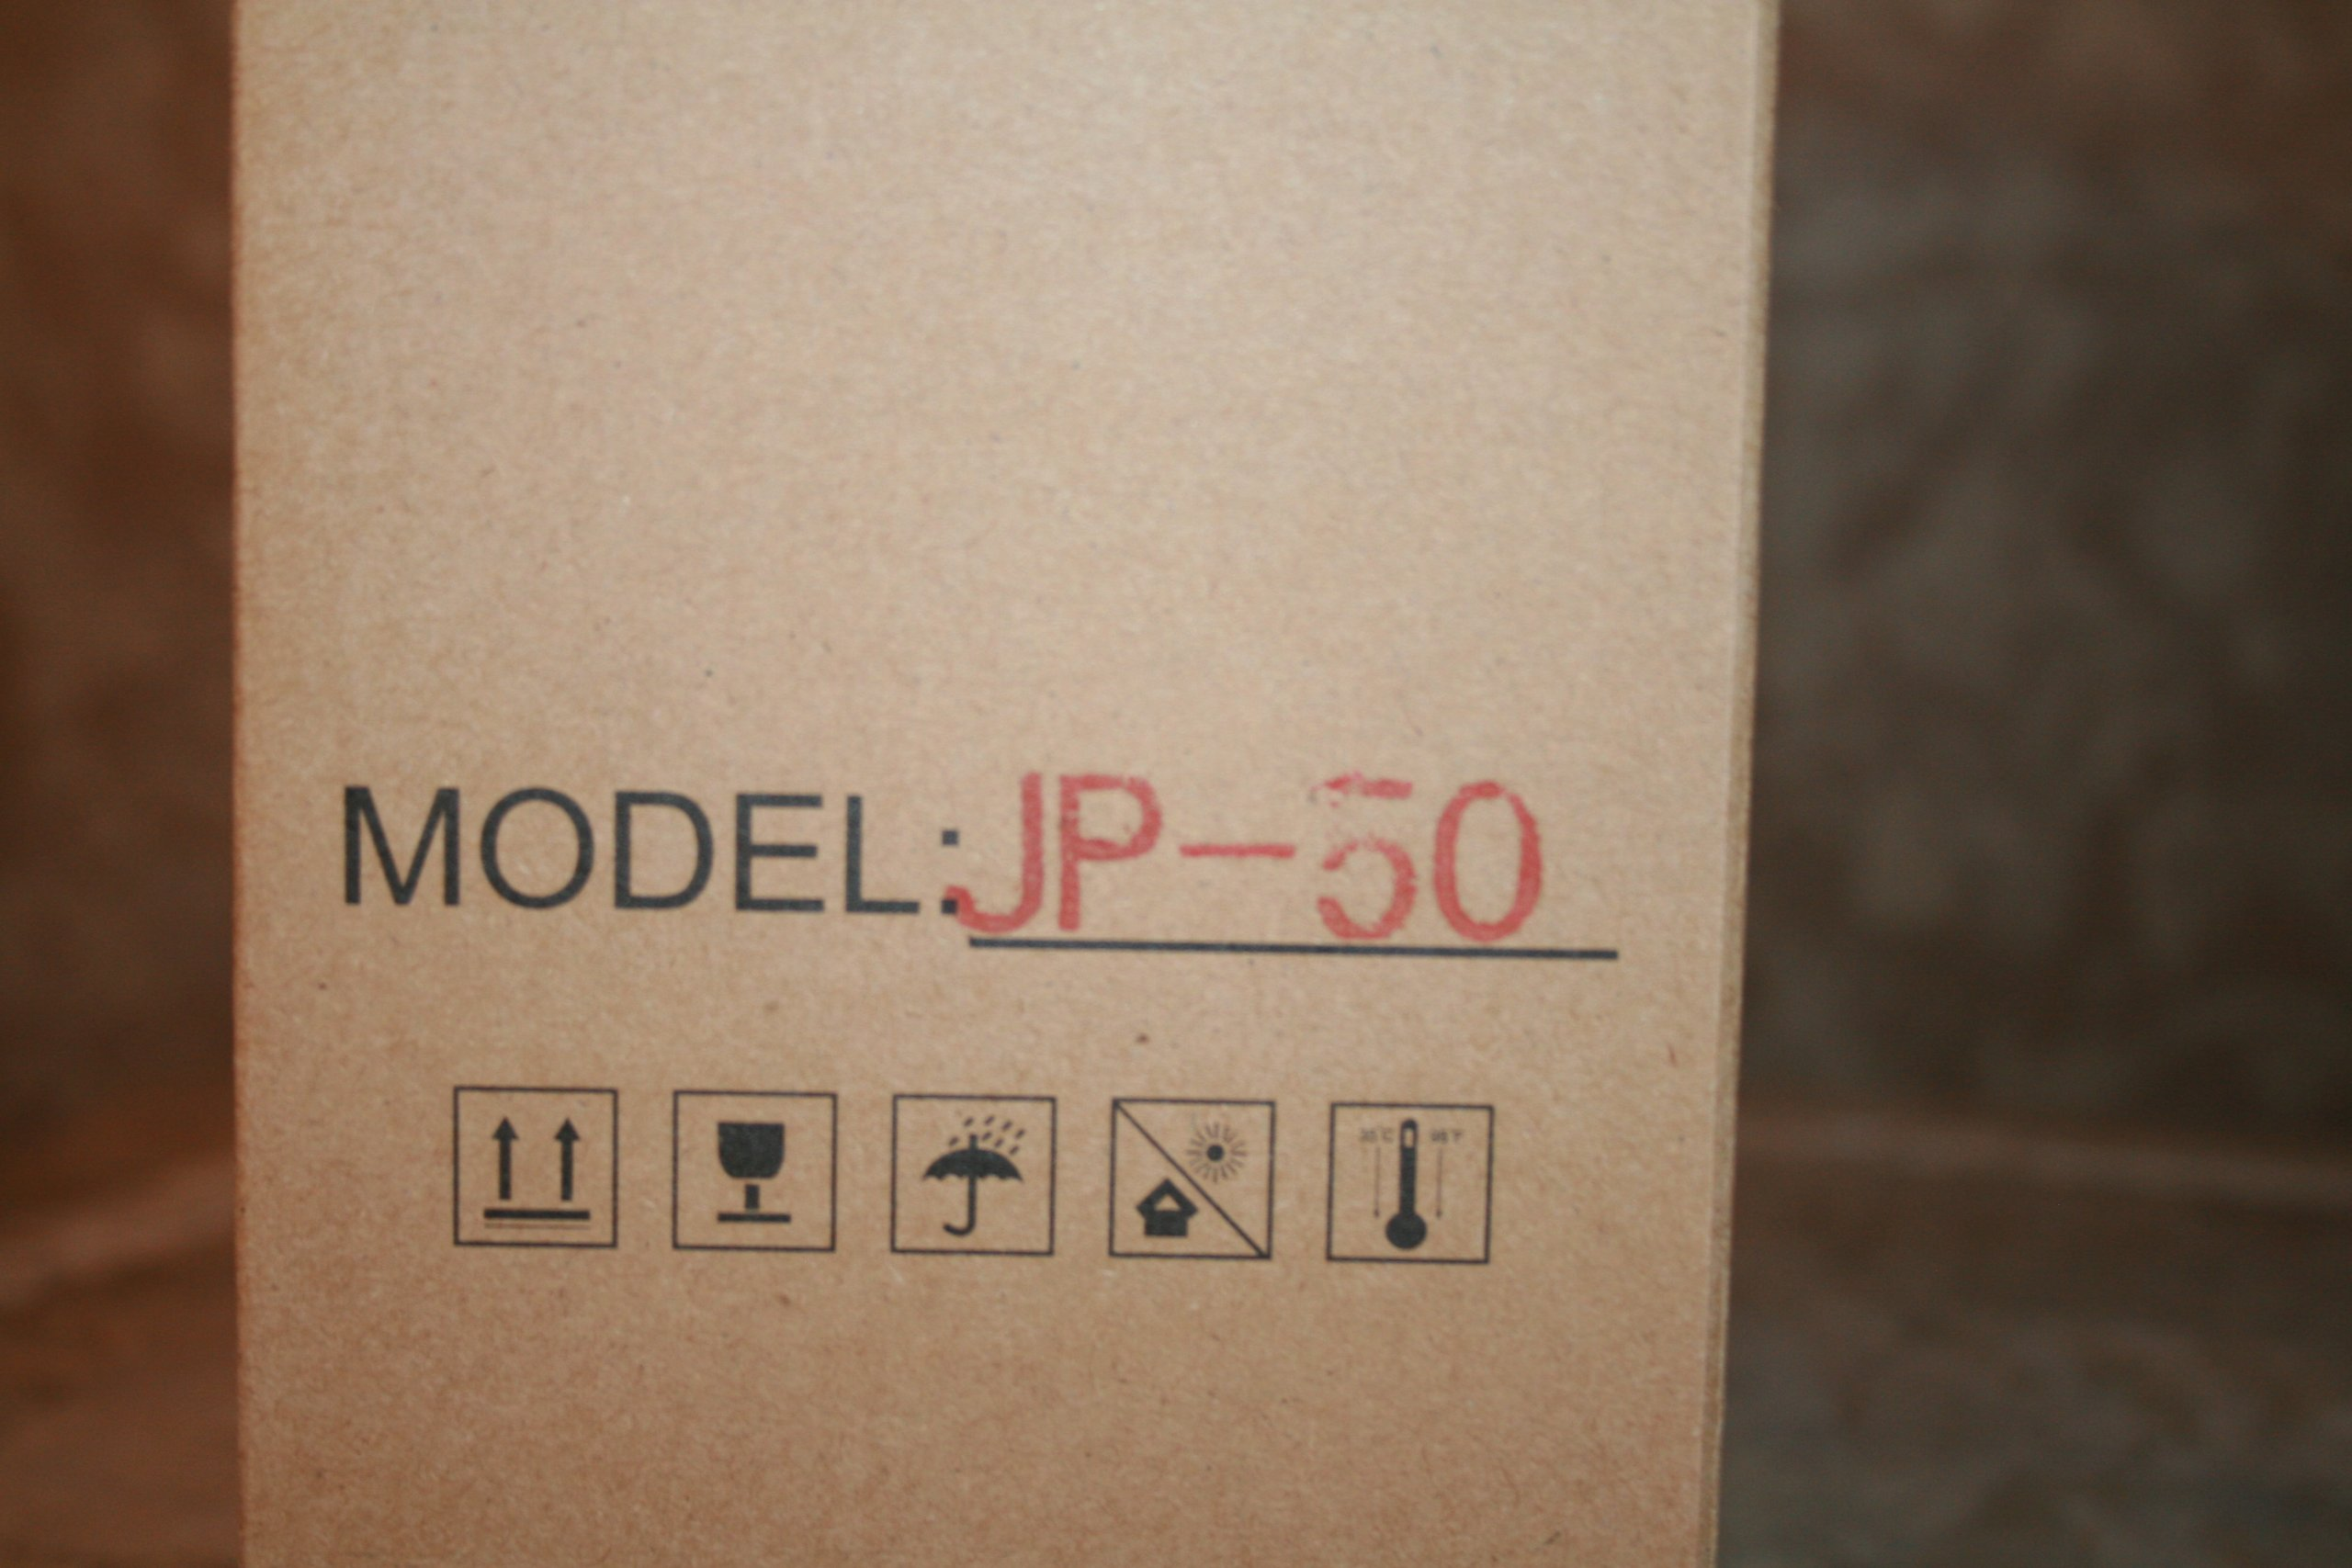 10 Ricoh JP-50, Part # 893015, Savin Part # 4555, Type 350, Gestetner CPMT13, Lanier LDD150, Standard Part # 3322 Compatible Master Rolls. by Ricoh / Savn / Gestetner Compatible (Image #5)